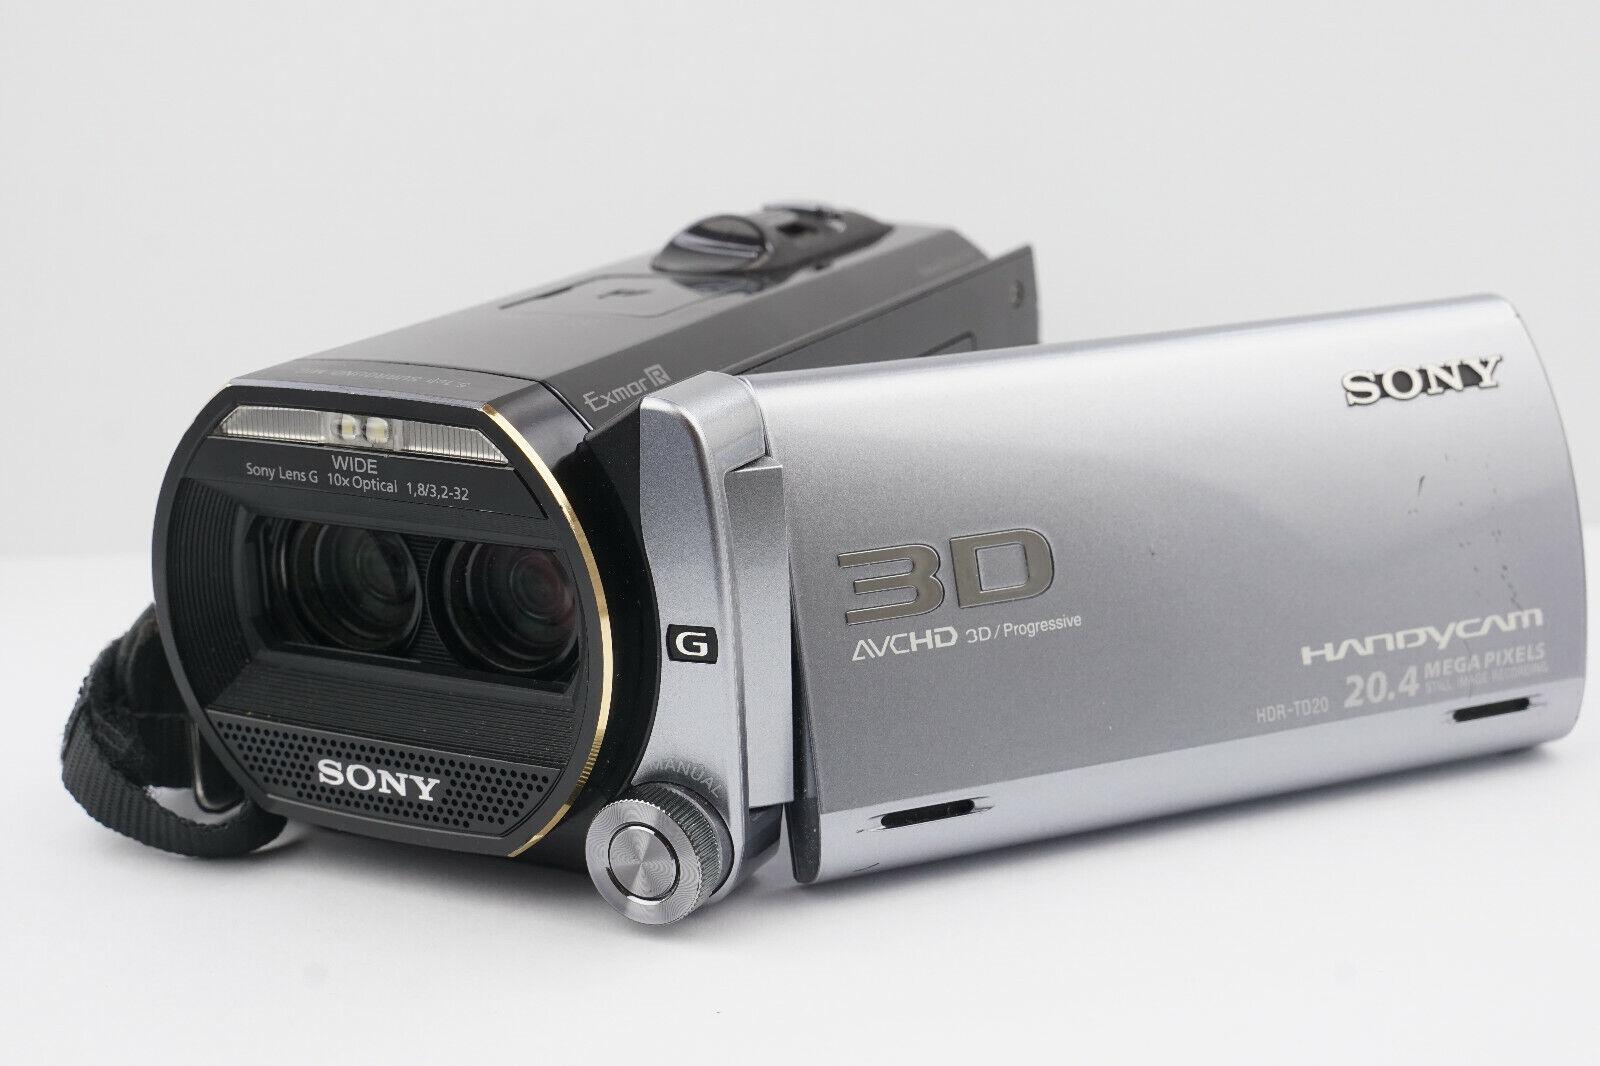 Sony HDR-TD20VE 3D Camcorder Handycam +3,5